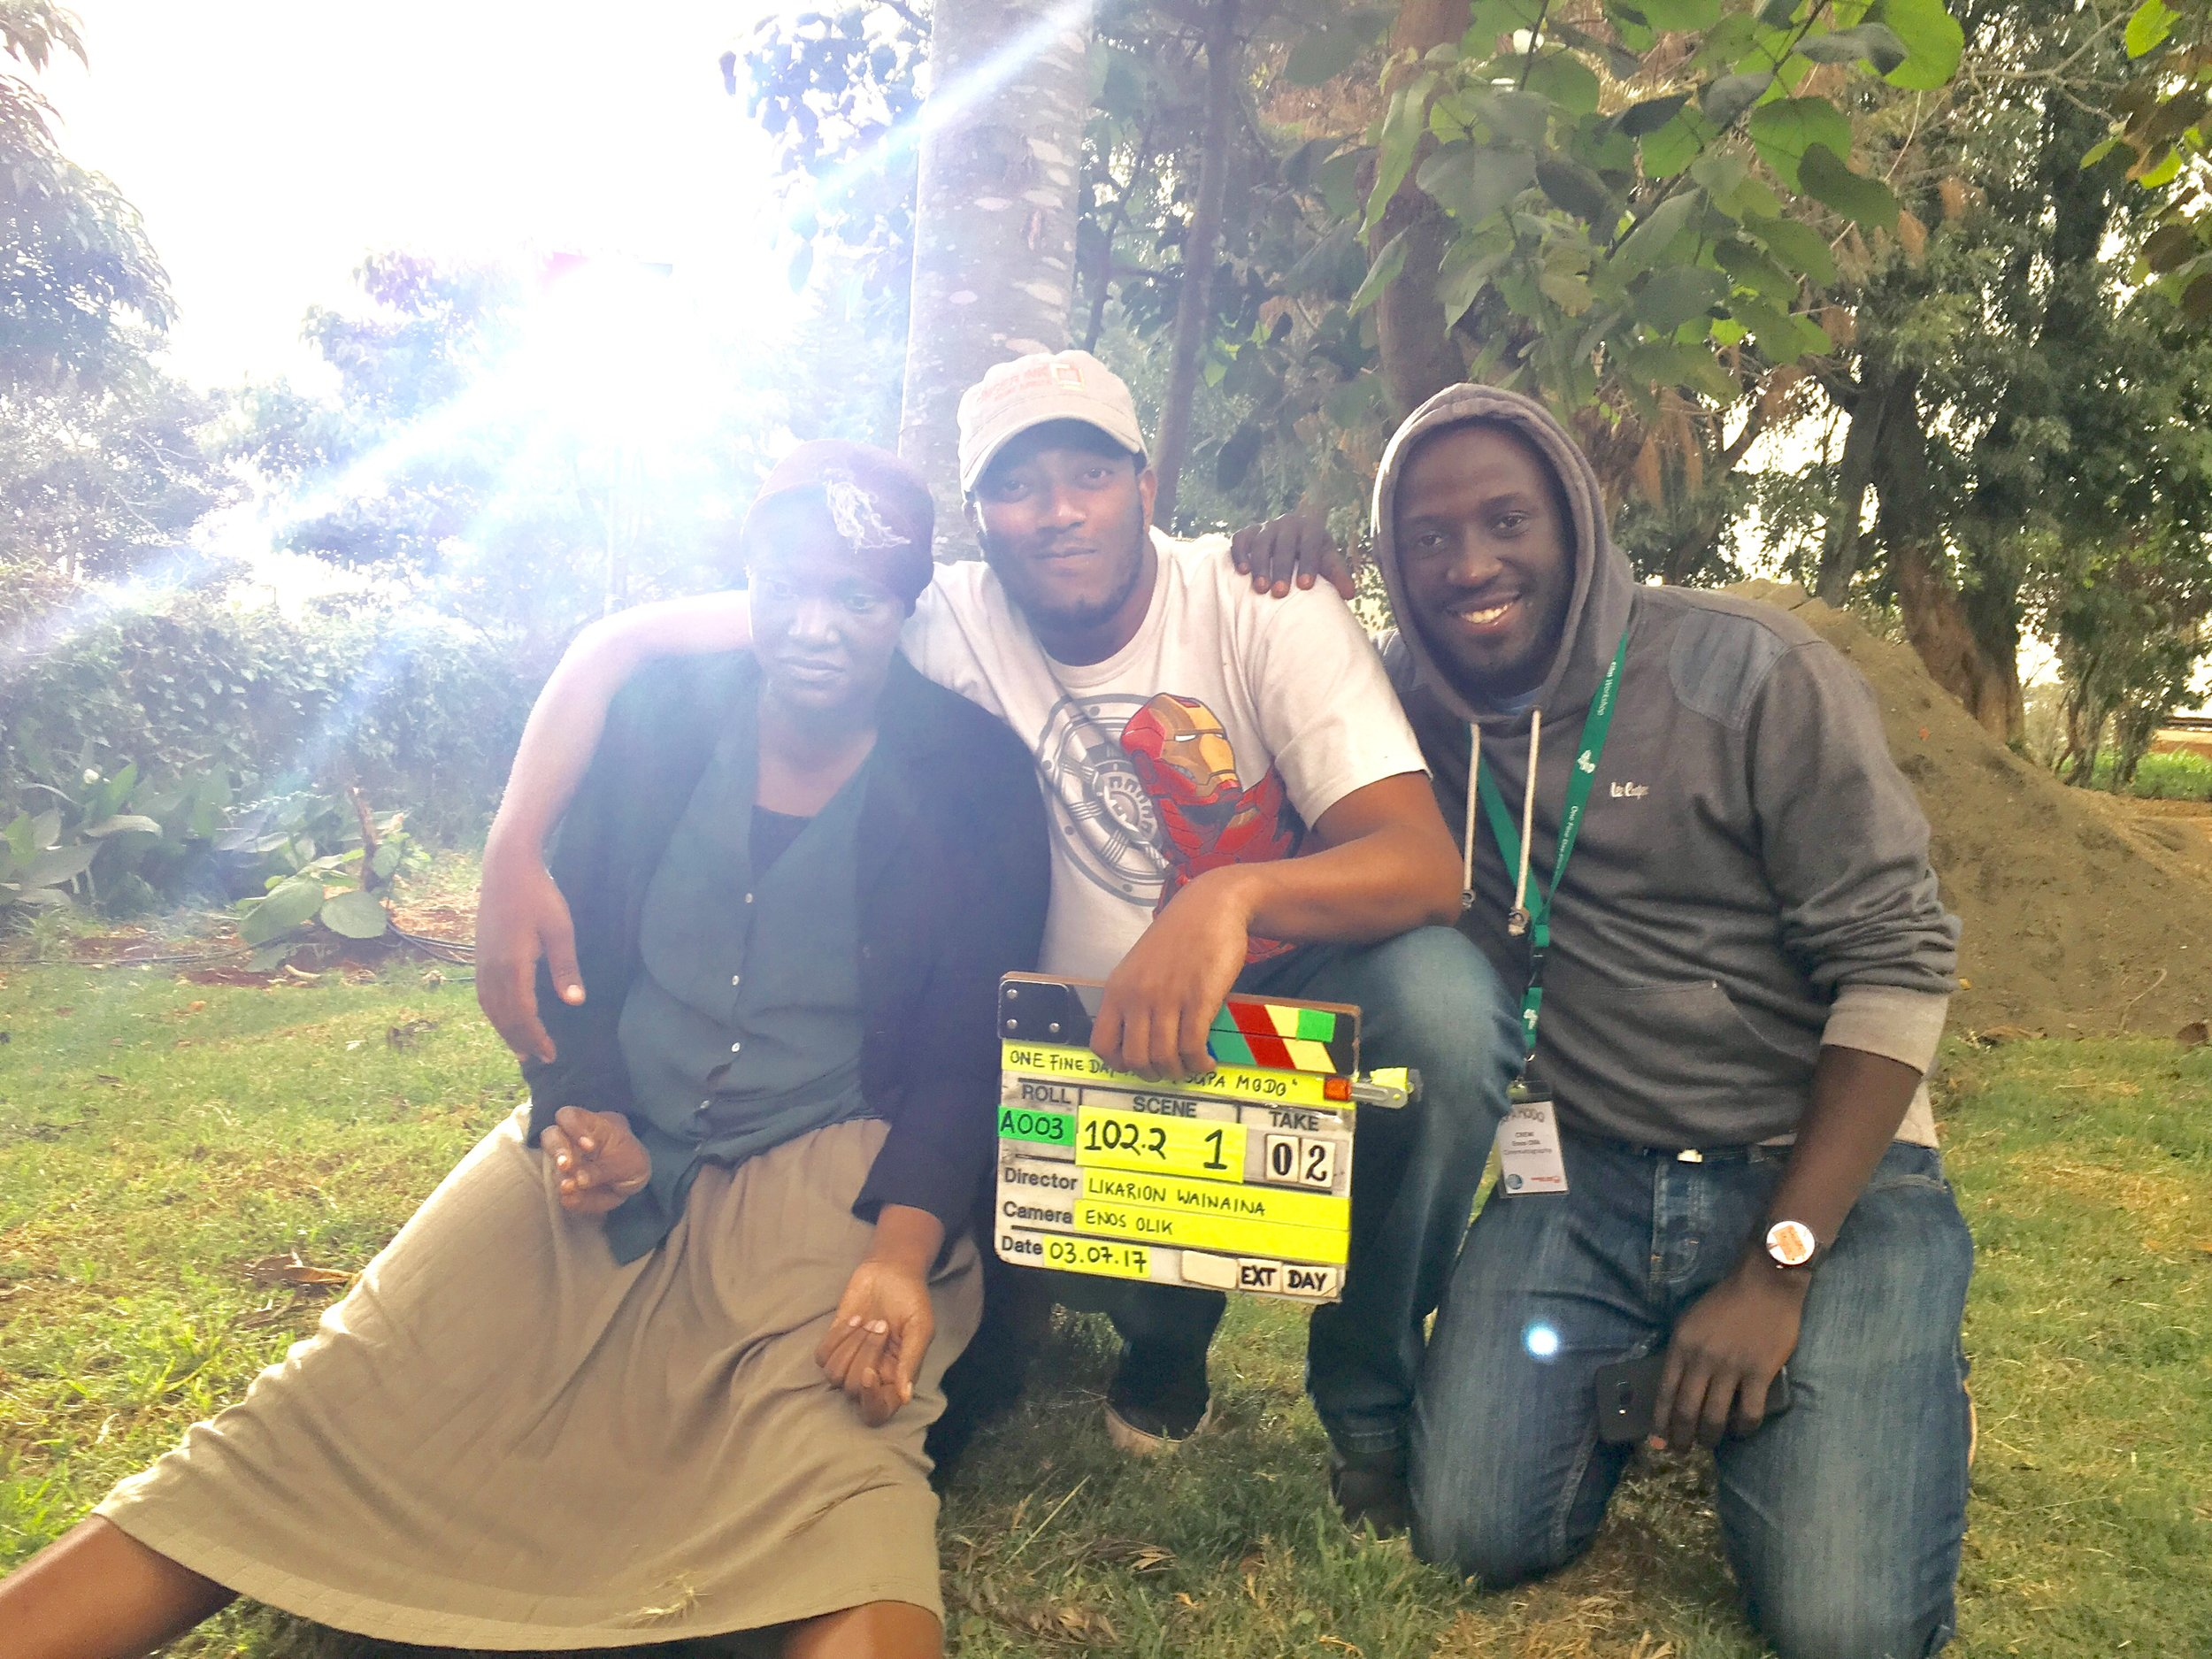 Maryanne Nungo as Kathryn, director Likarion Wainaina and cinematographer Enos Olik.